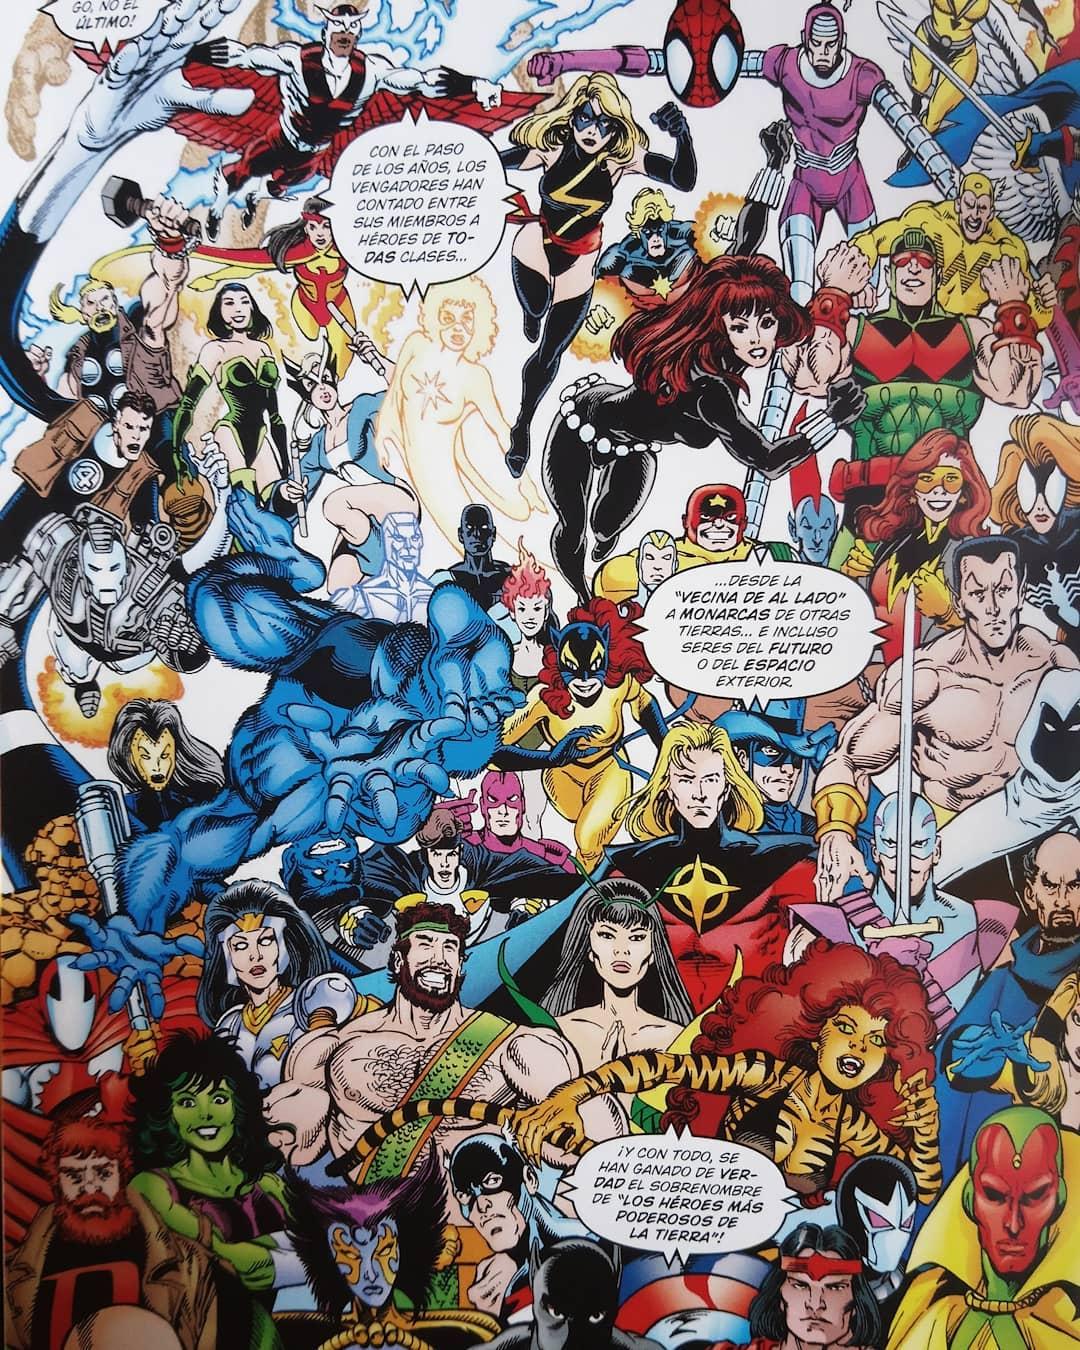 Heroes Return: Los Vengadores #1